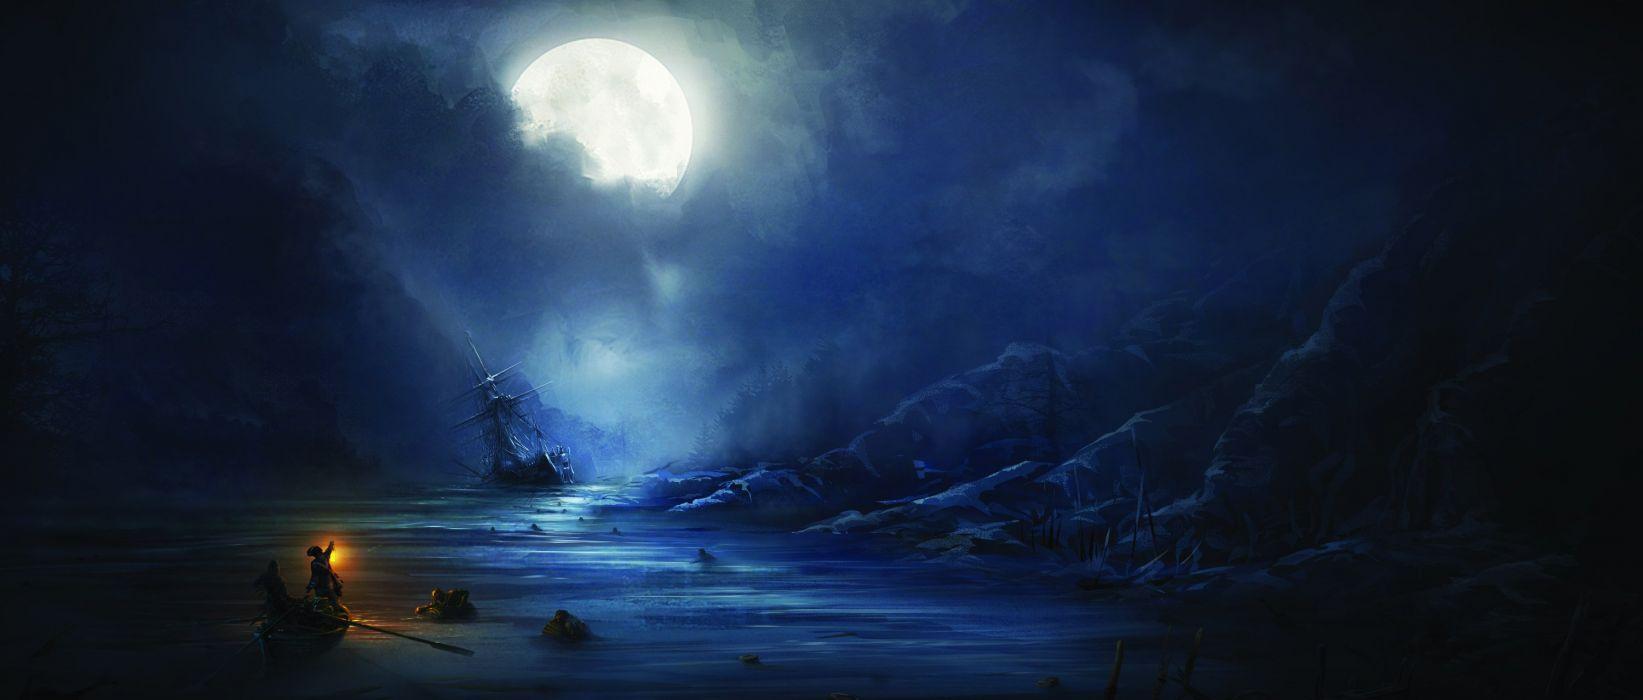 Assassin's Creed 3 sea night moon ship people wallpaper